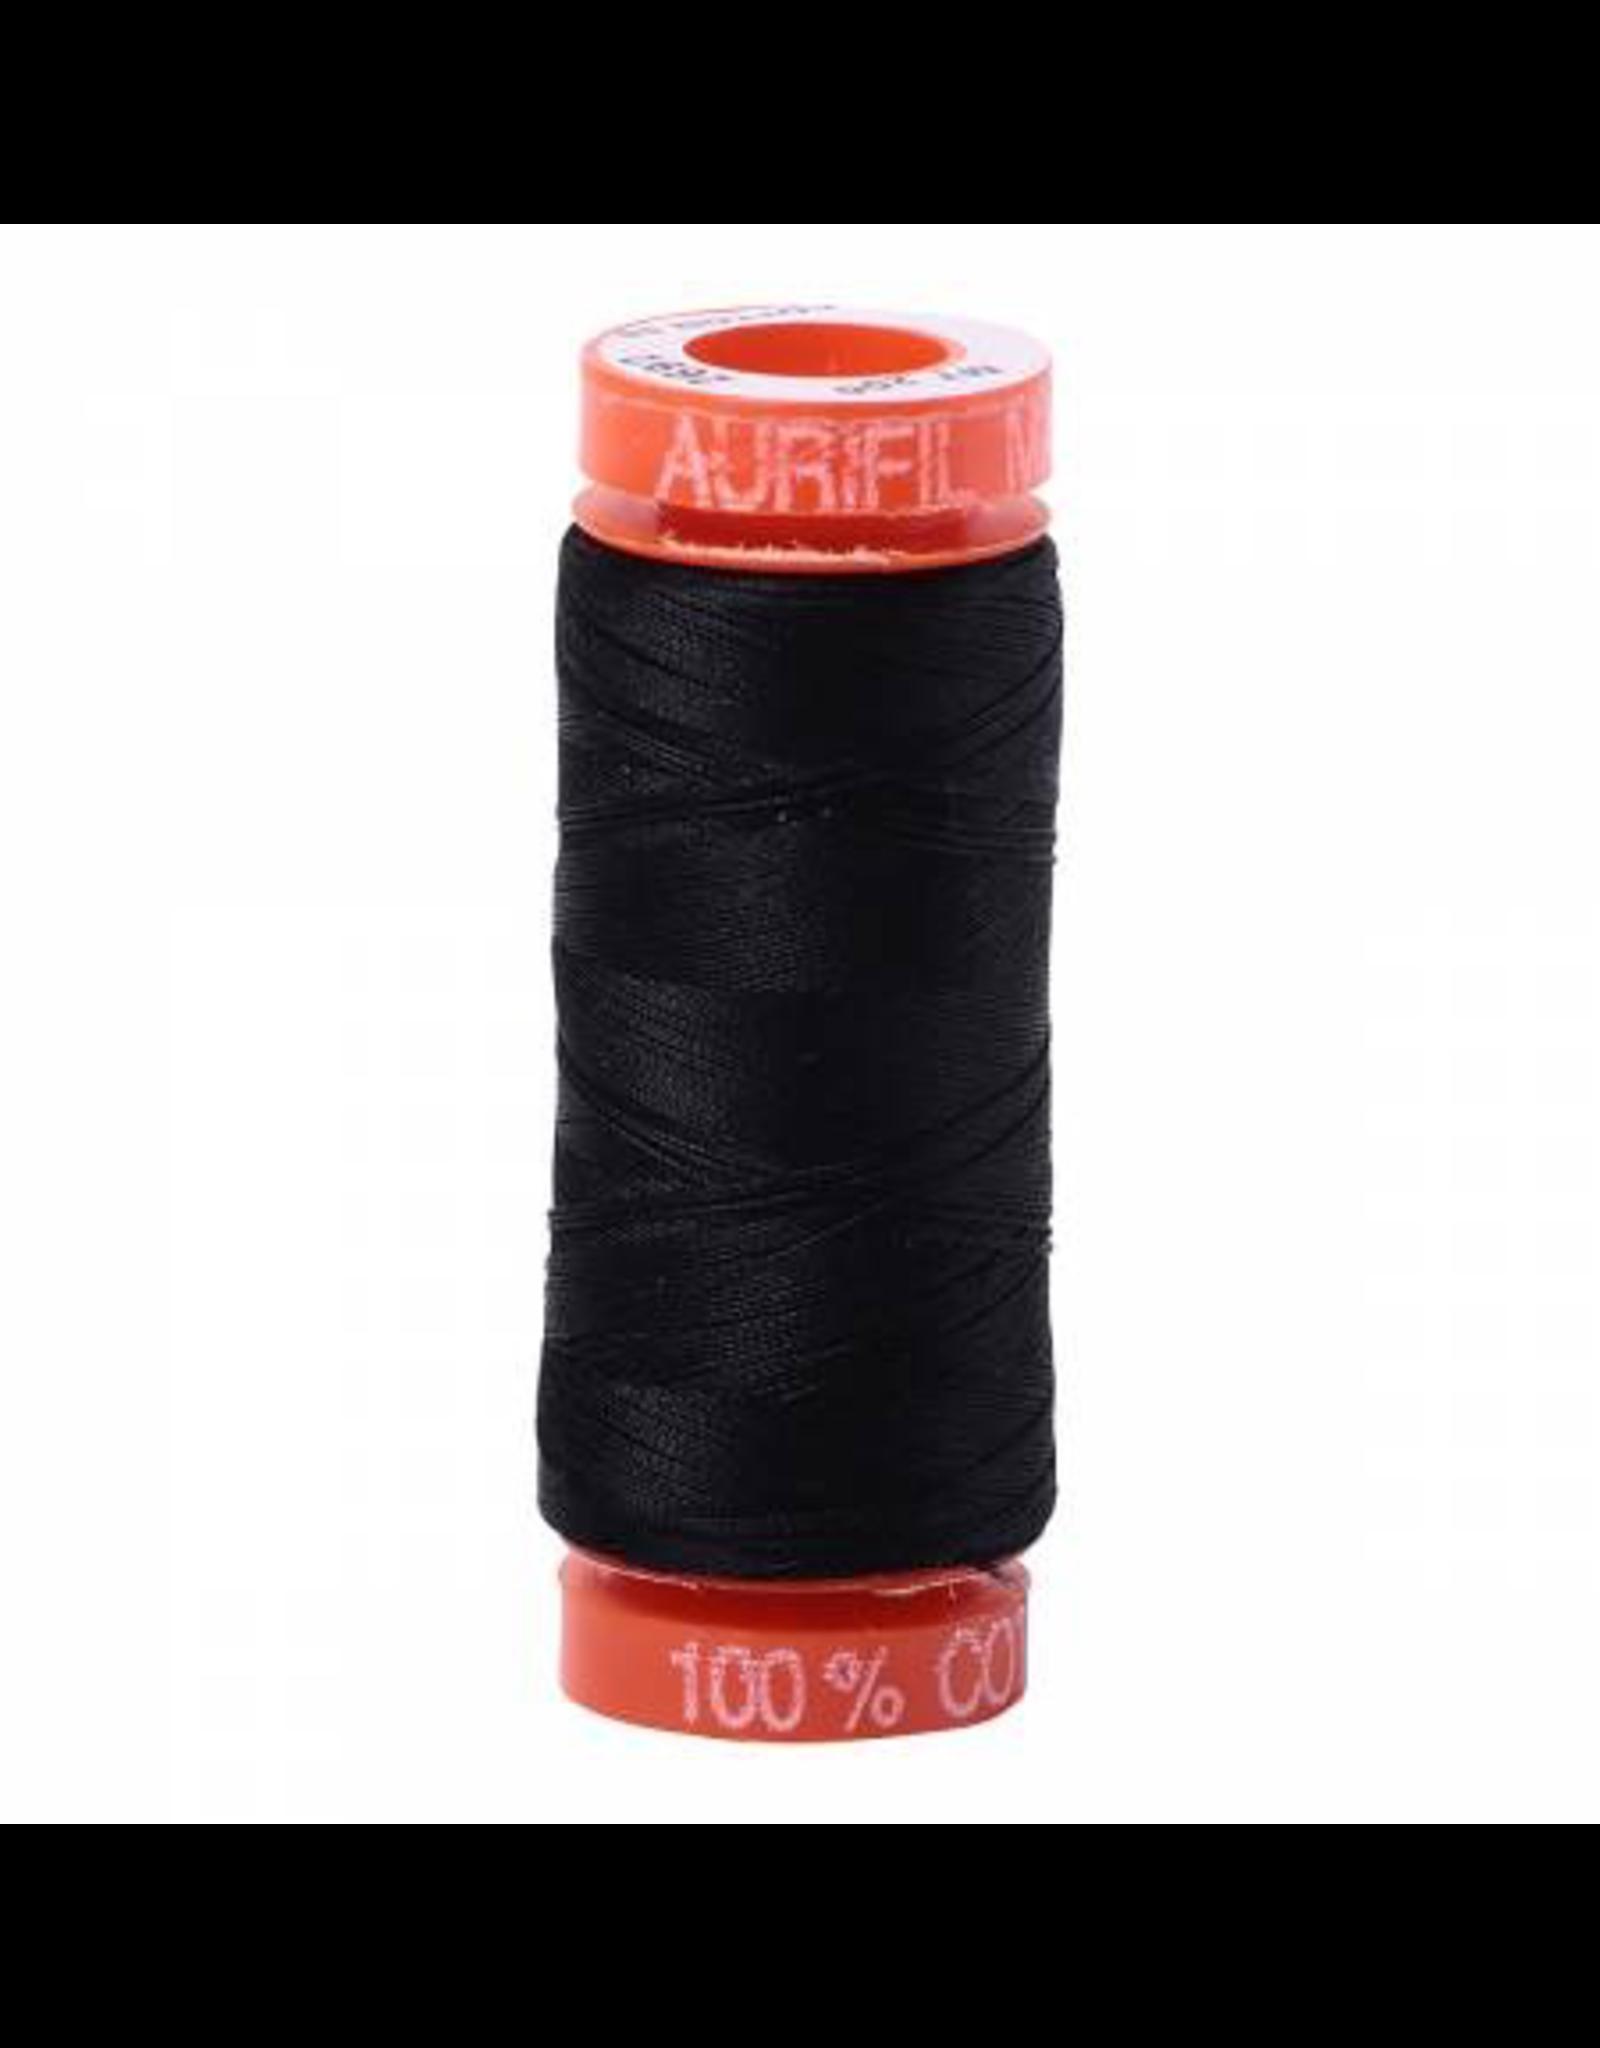 Aurifil Cotton Thread 50 wt 220 yd Black